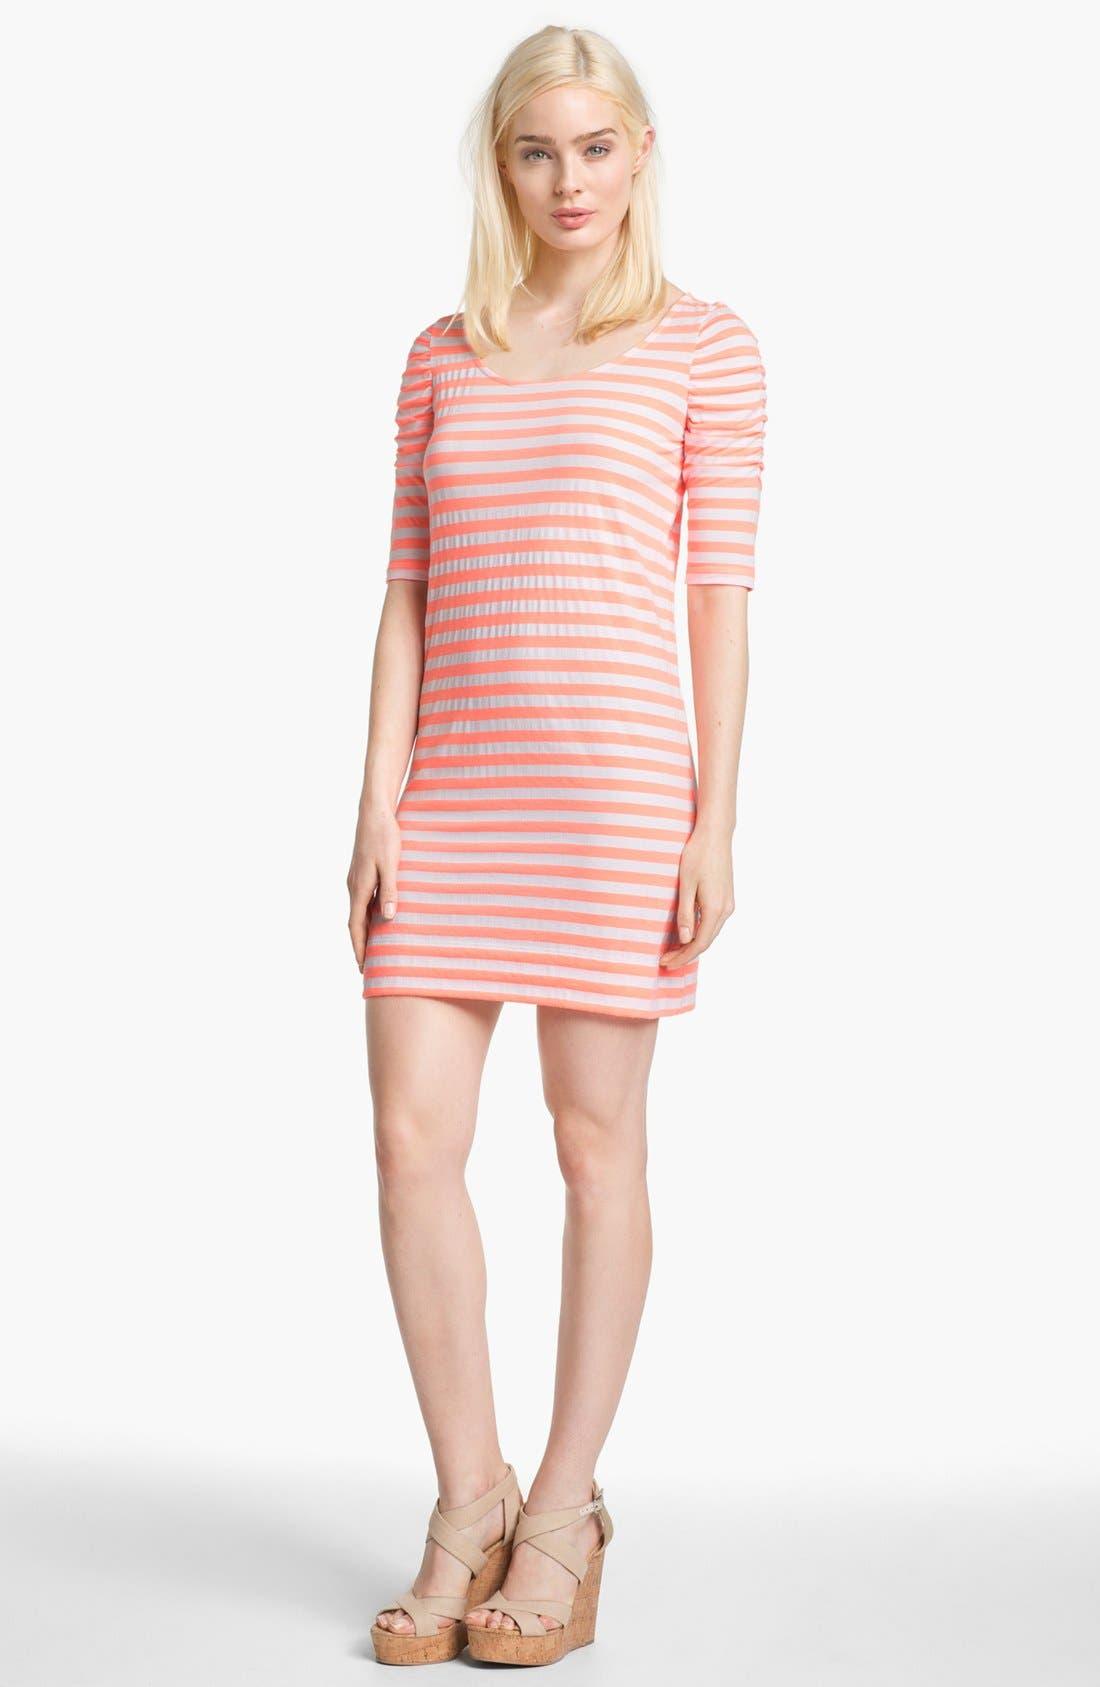 Main Image - Lilly Pulitzer® 'Kaley' Stripe T-Shirt Dress